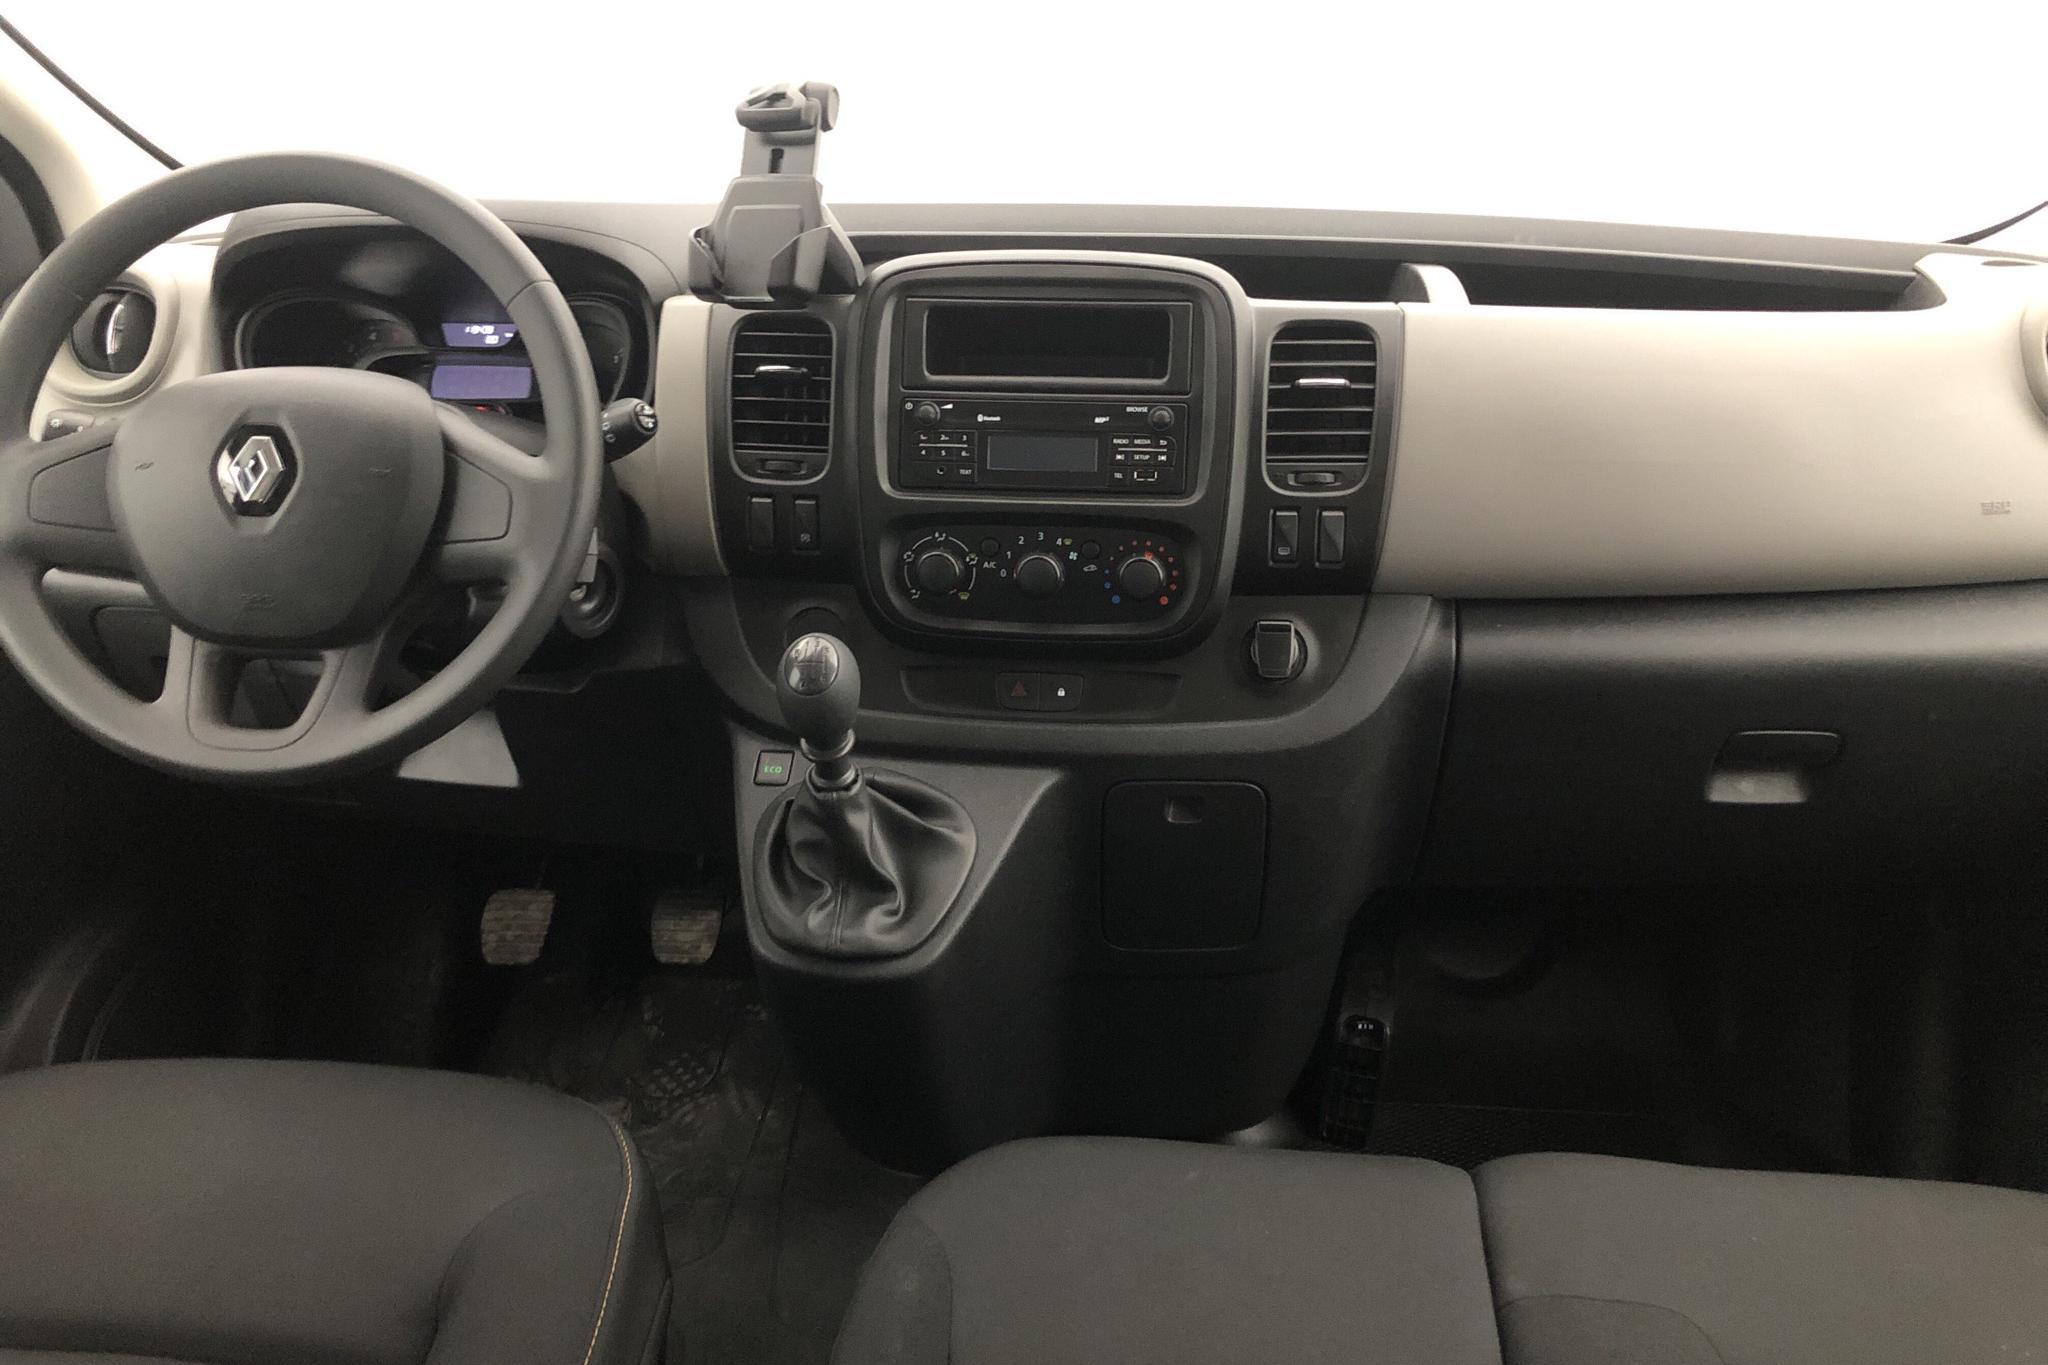 Renault Trafic 1.6 dCi Passenger (125hk) - 119 430 km - Manual - silver - 2017